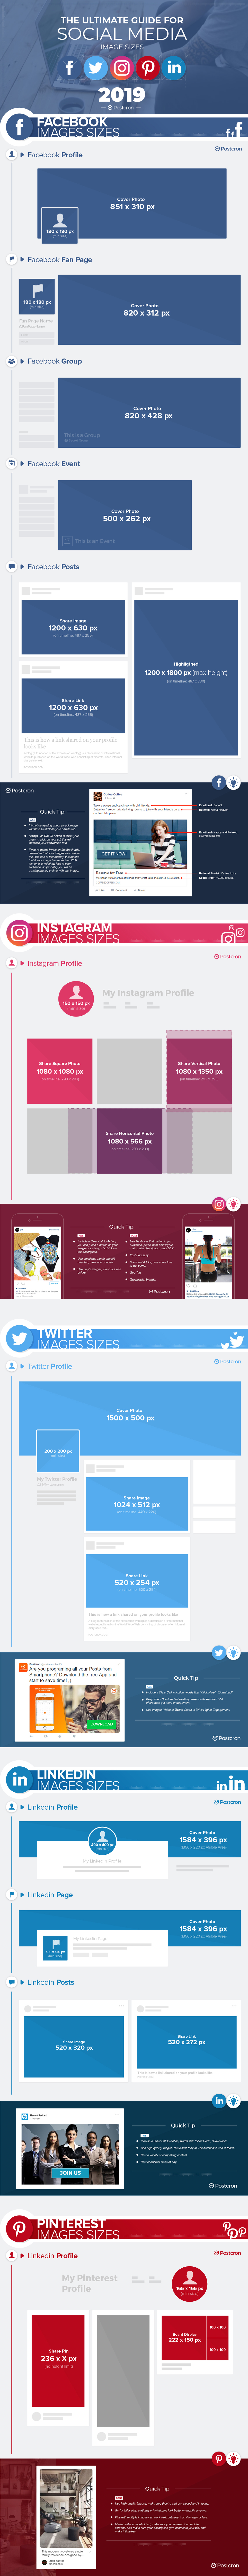 Social Media image sizes infographic 2019